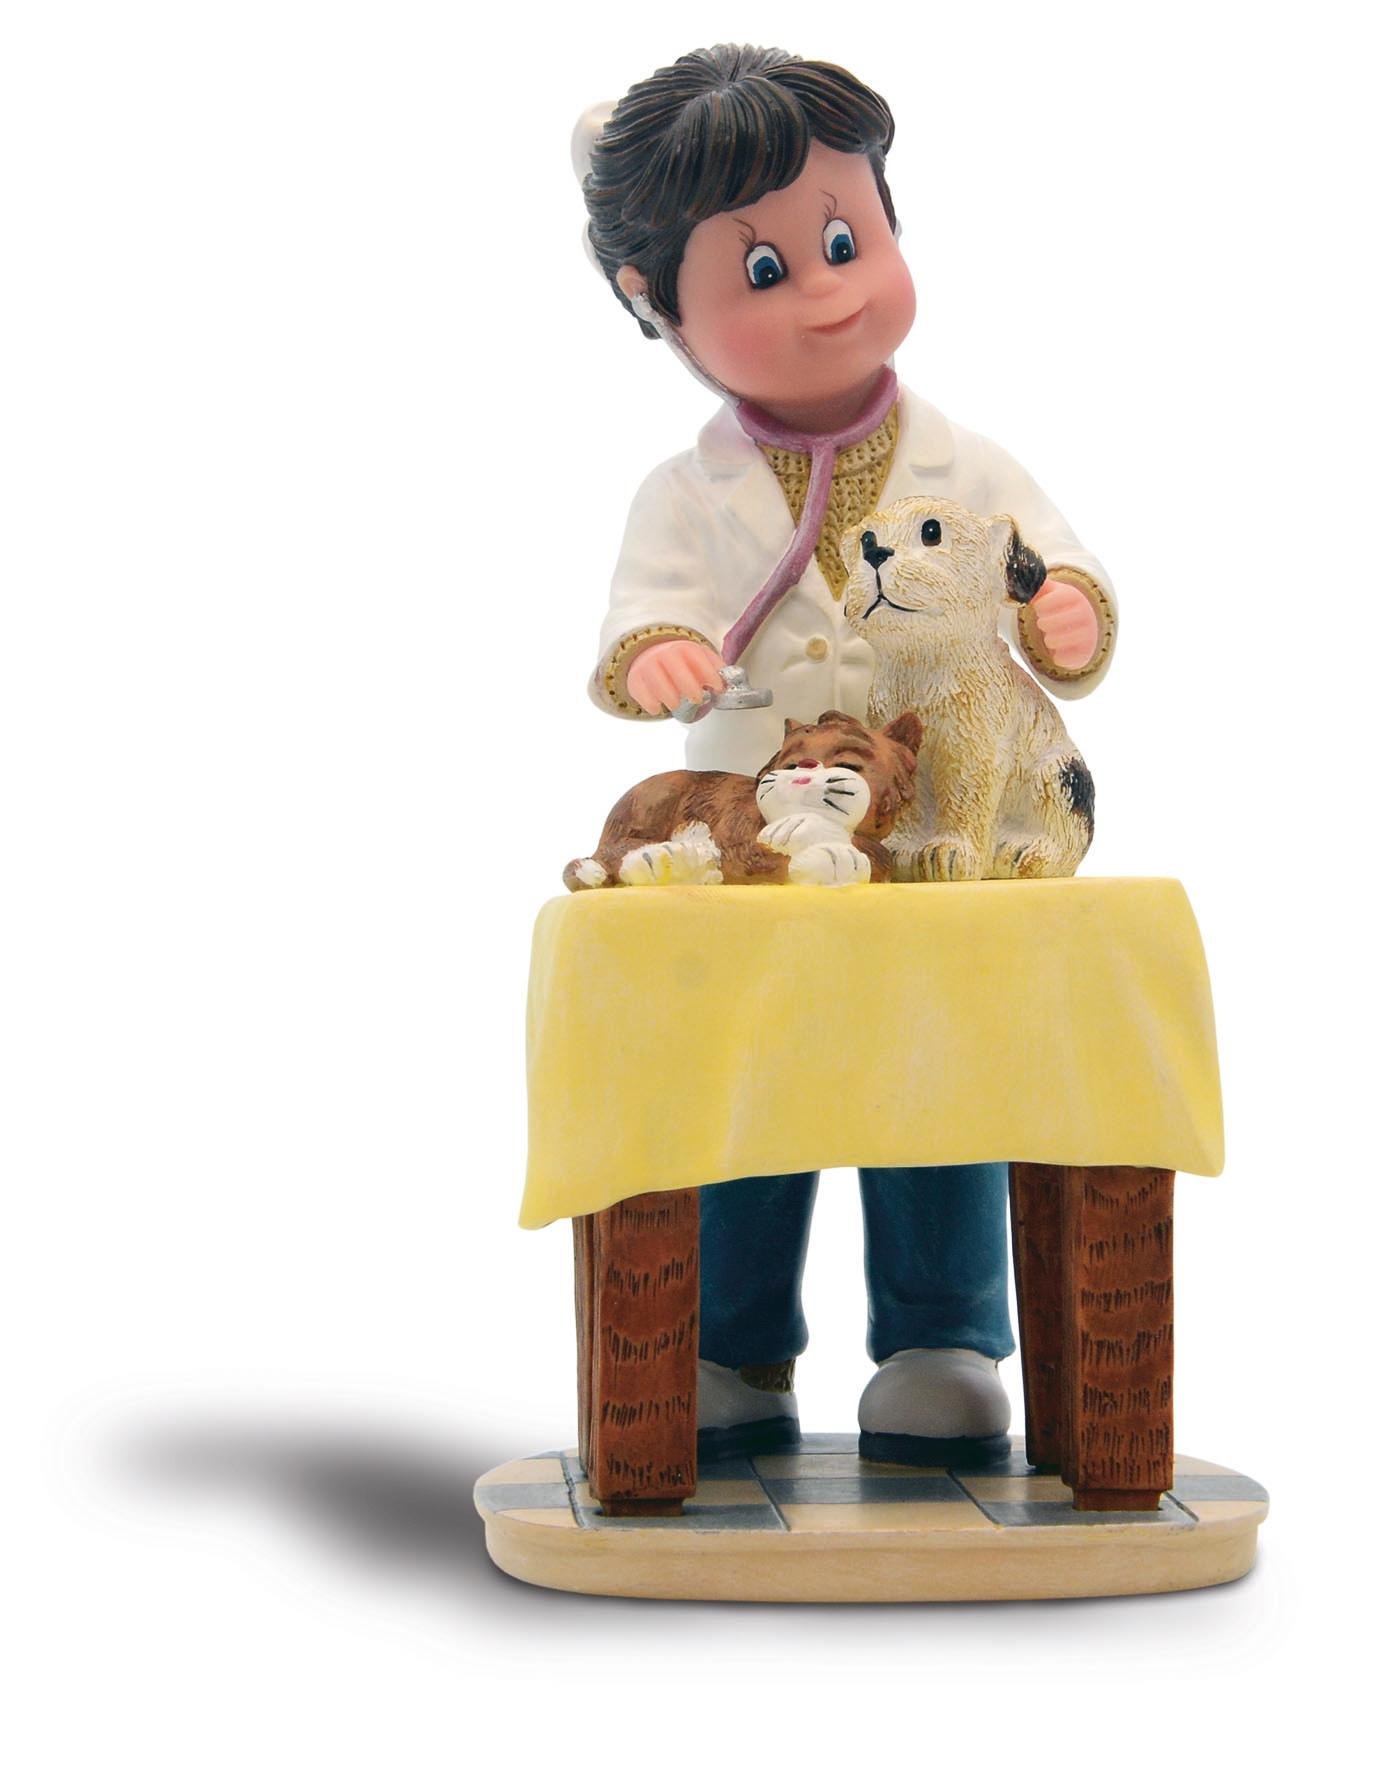 figura-veterinaria-nadal-studio-746773-pequeños-tesoros-lomejorsg.jpg